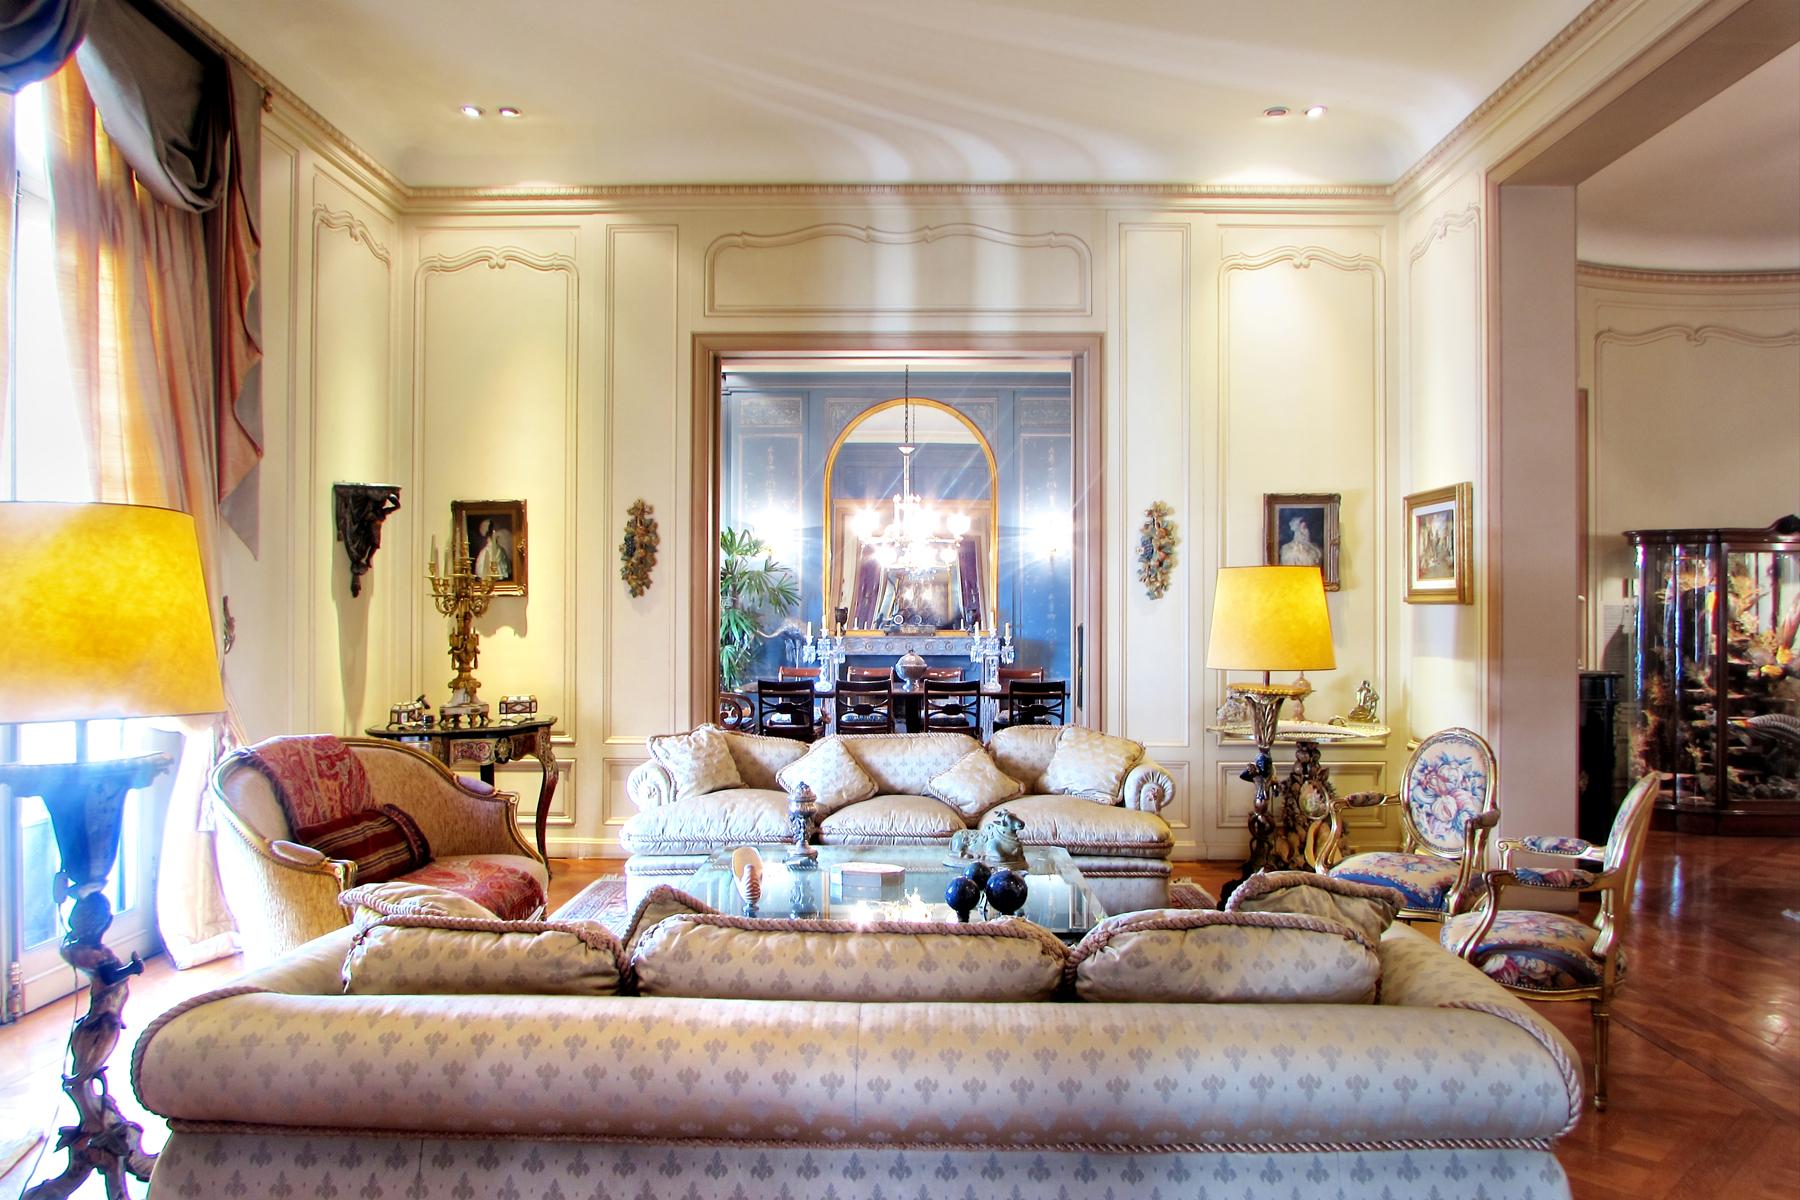 Квартира для того Продажа на Majestic 530 m2 apartment Juncal 900, Buenos Aires, Буэнос-Айрес, C1062ABG Аргентина